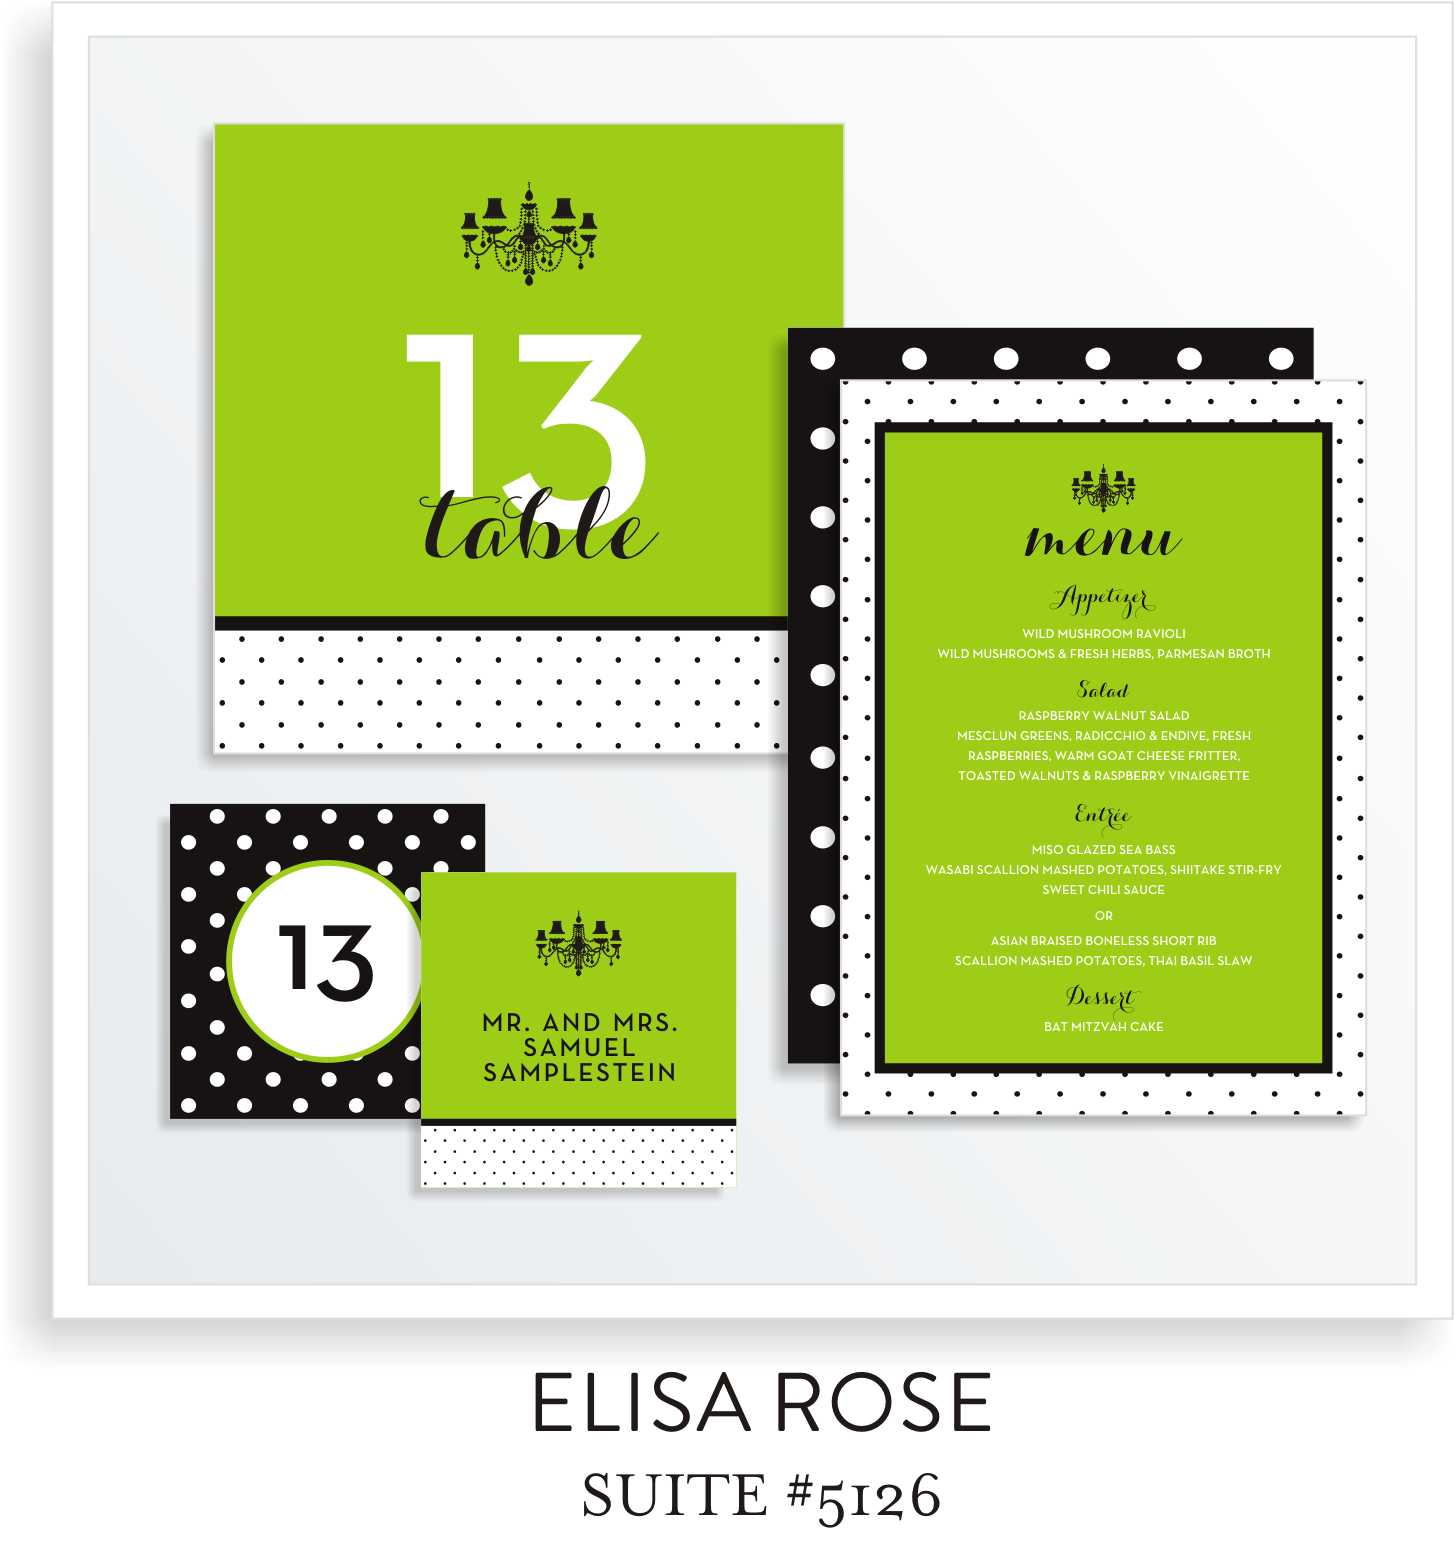 Table Top Decor Bat Mitzvah Suite 5126 - Elisa Rose